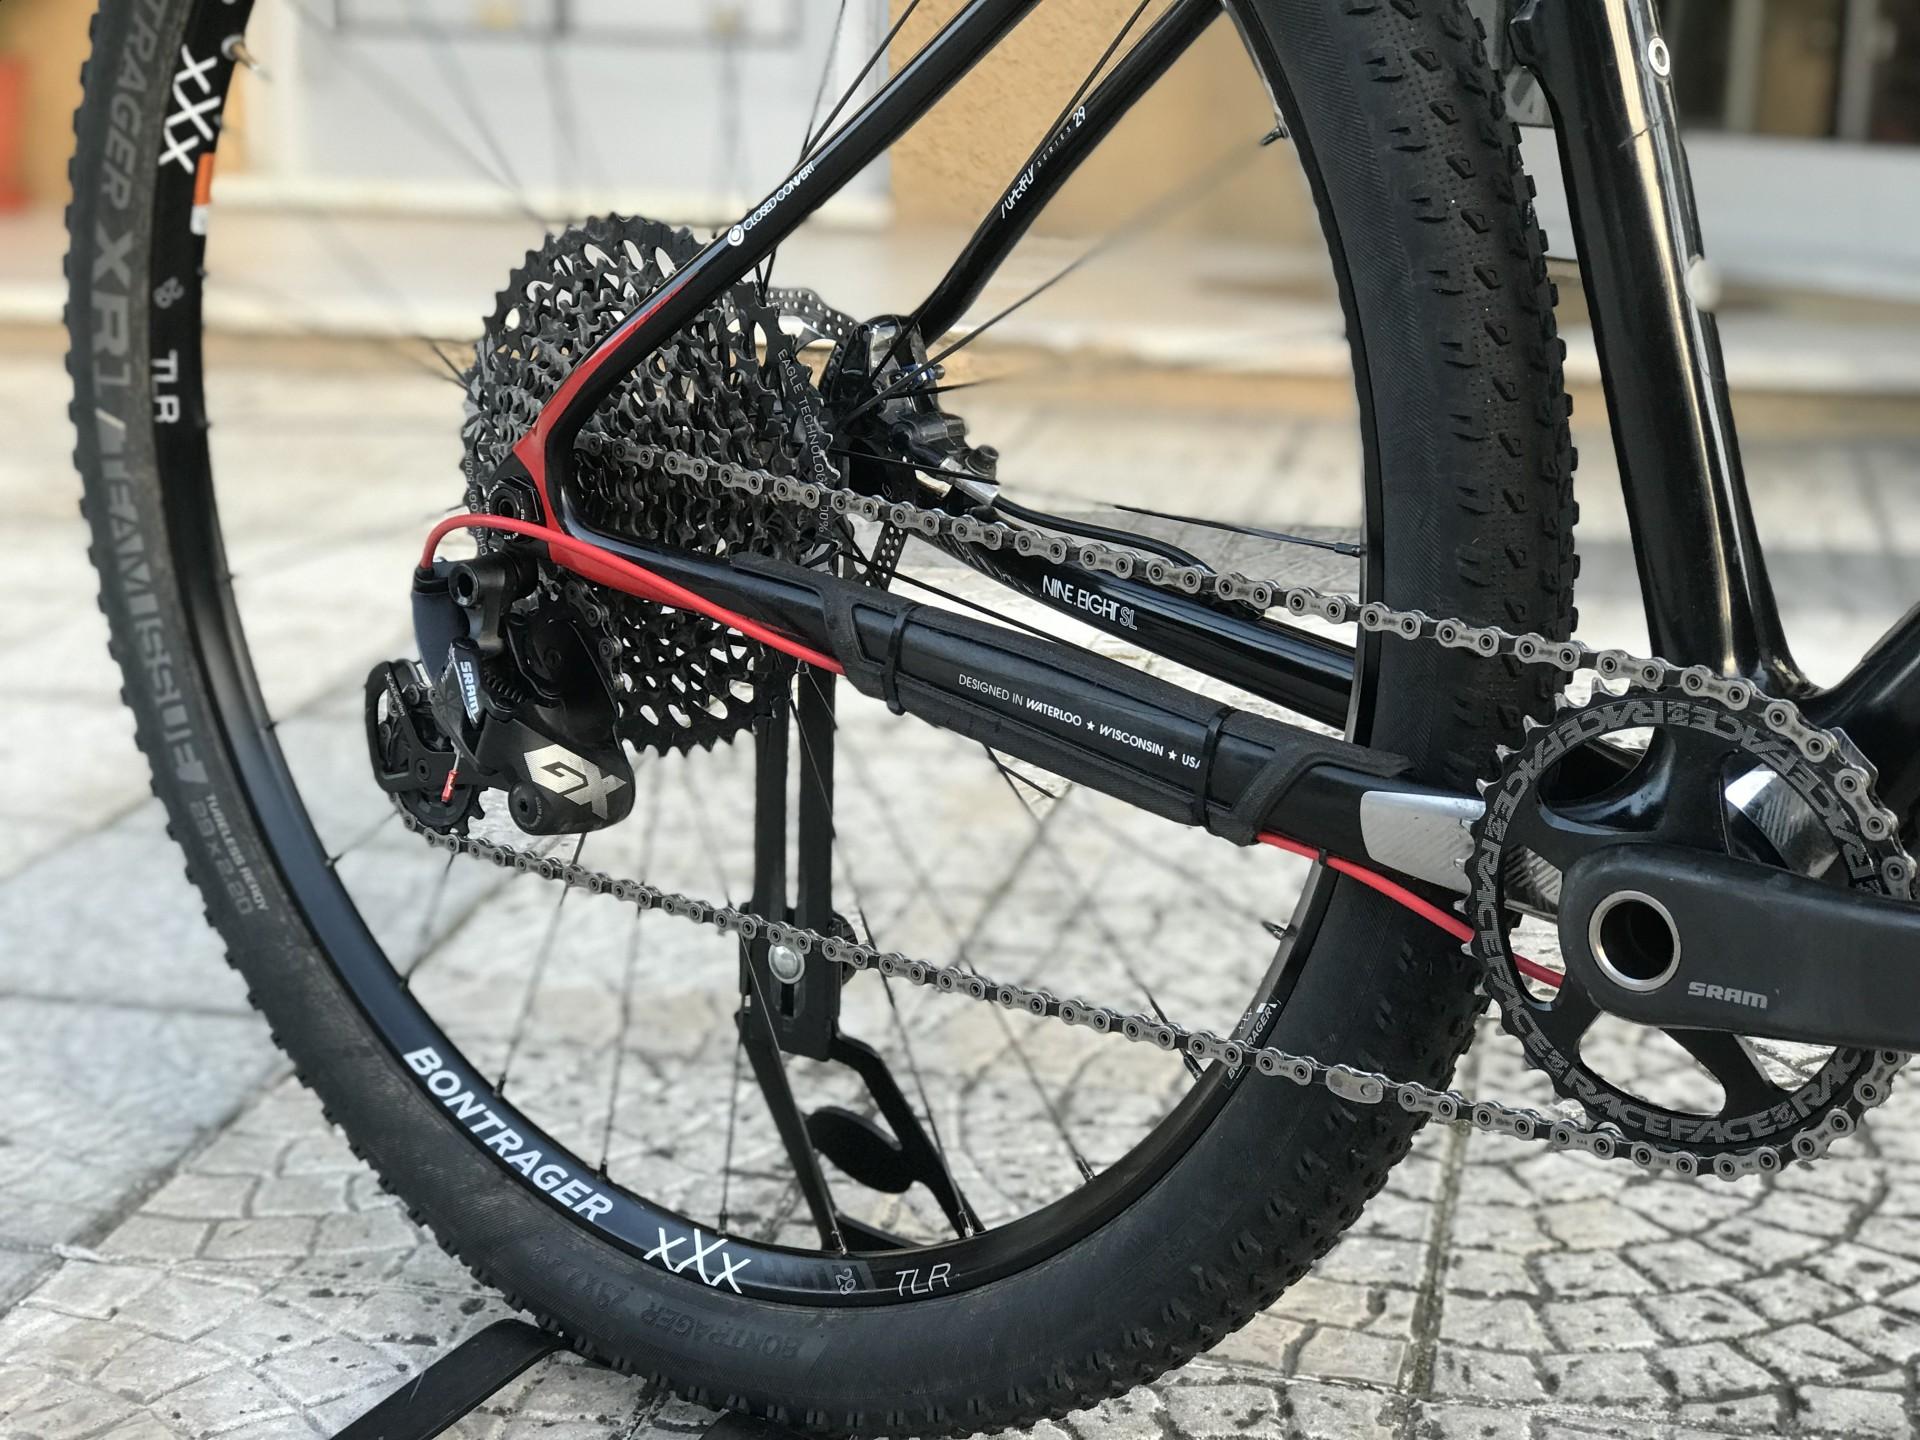 Bicicleta Trek Superfly 9.8 / Carbono / Usada